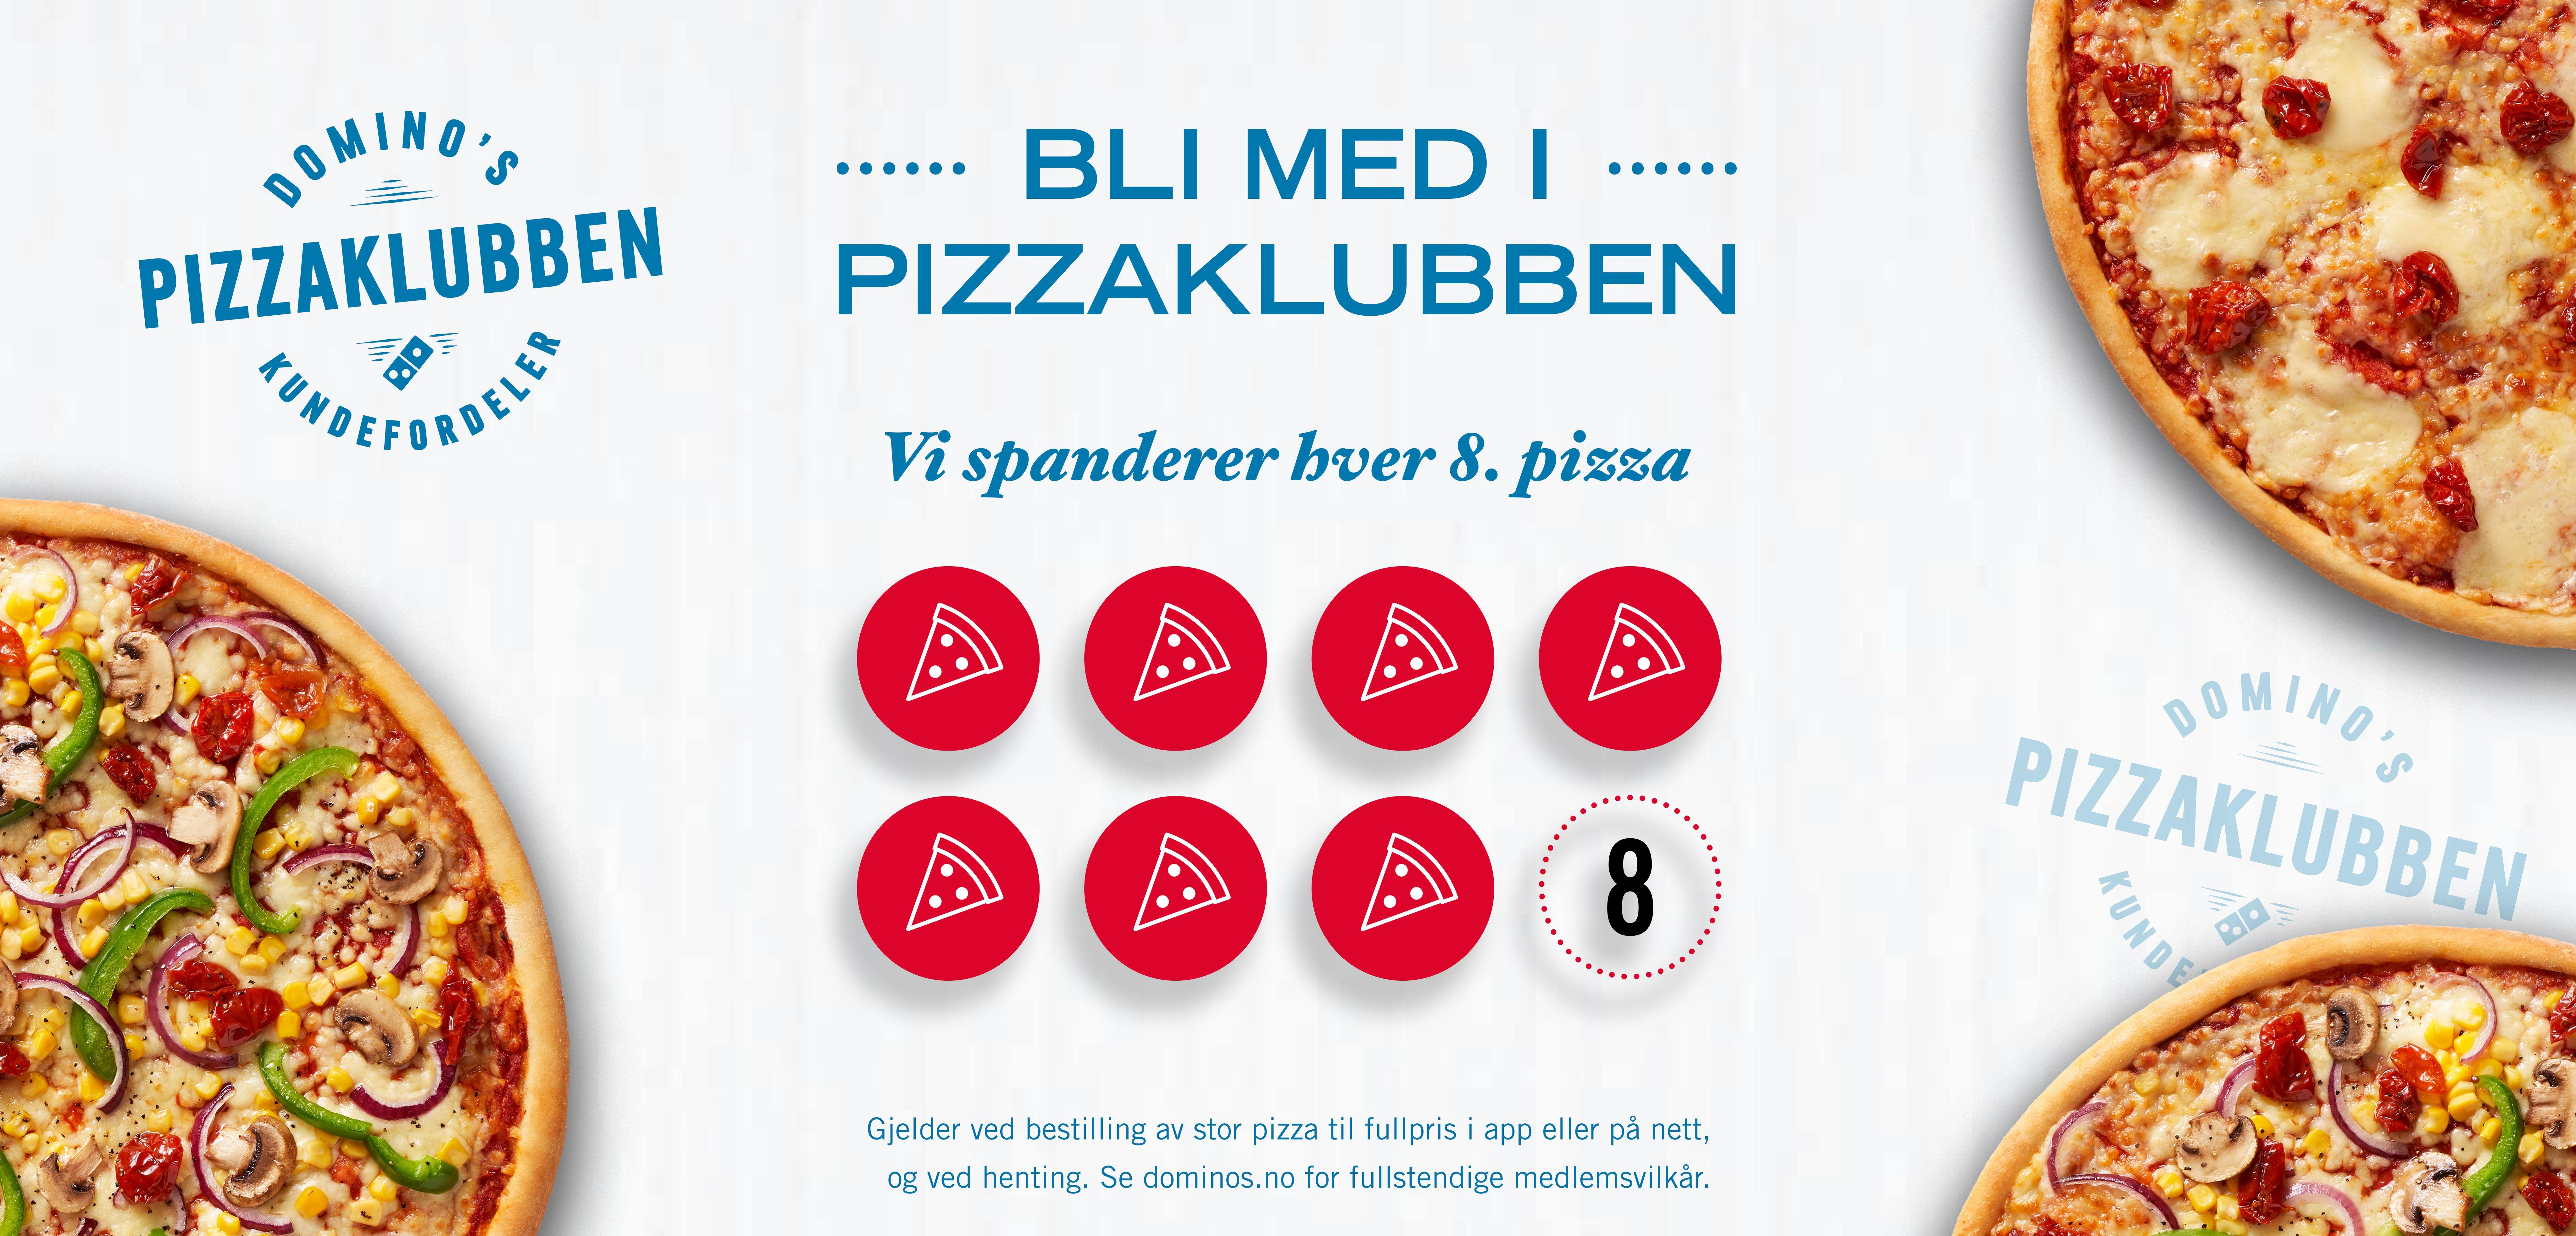 Pizzakluben